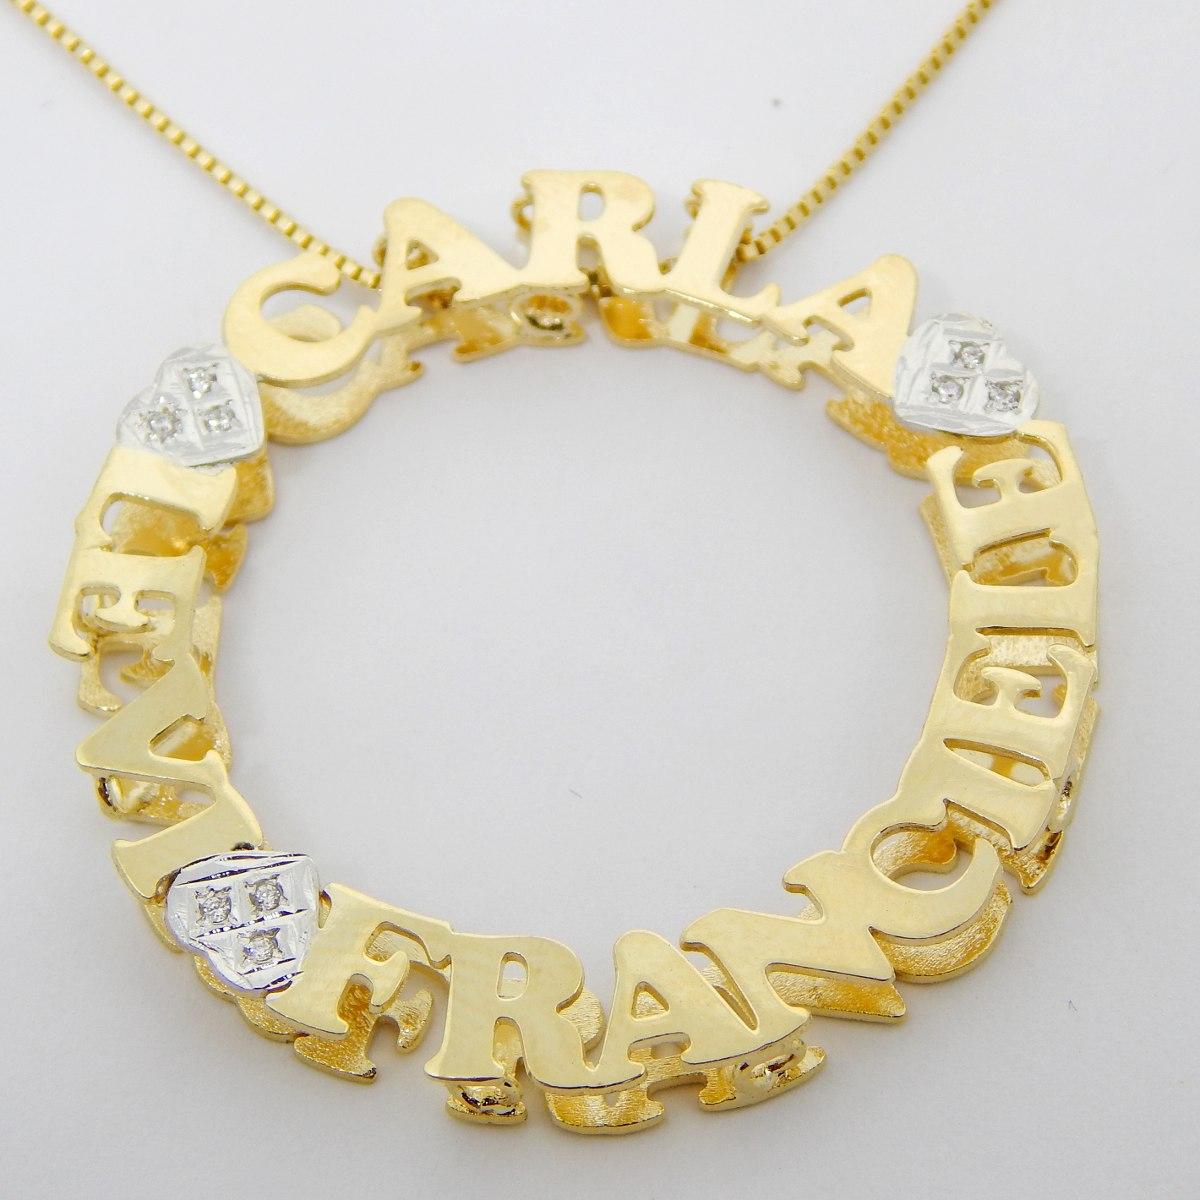 colar mandala 3 nomes personalizada banhado a ouro 18k. Carregando zoom. 17372934ad